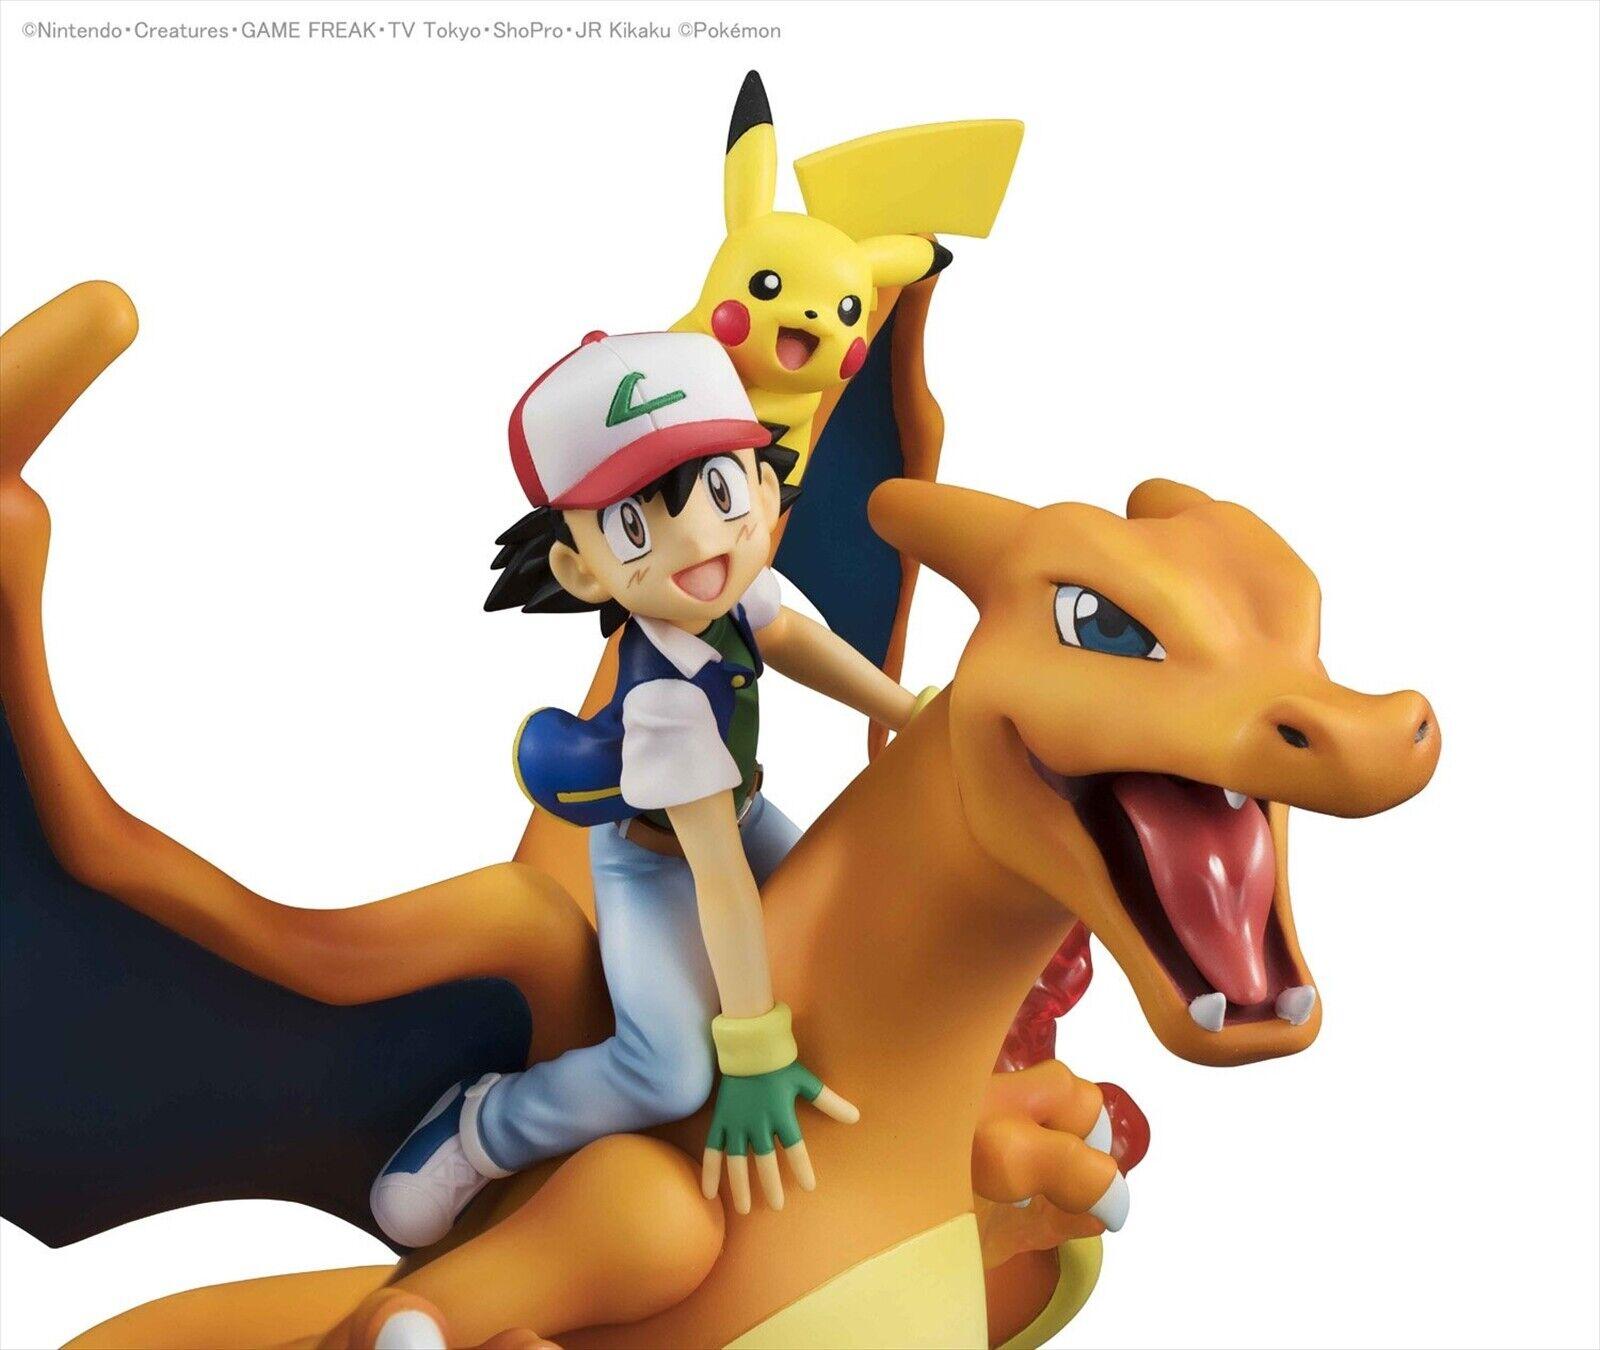 MegaHouse G.E.M.Series Pokemon Ash Ketchum & Pikachu & Charizard PVC Figure F S